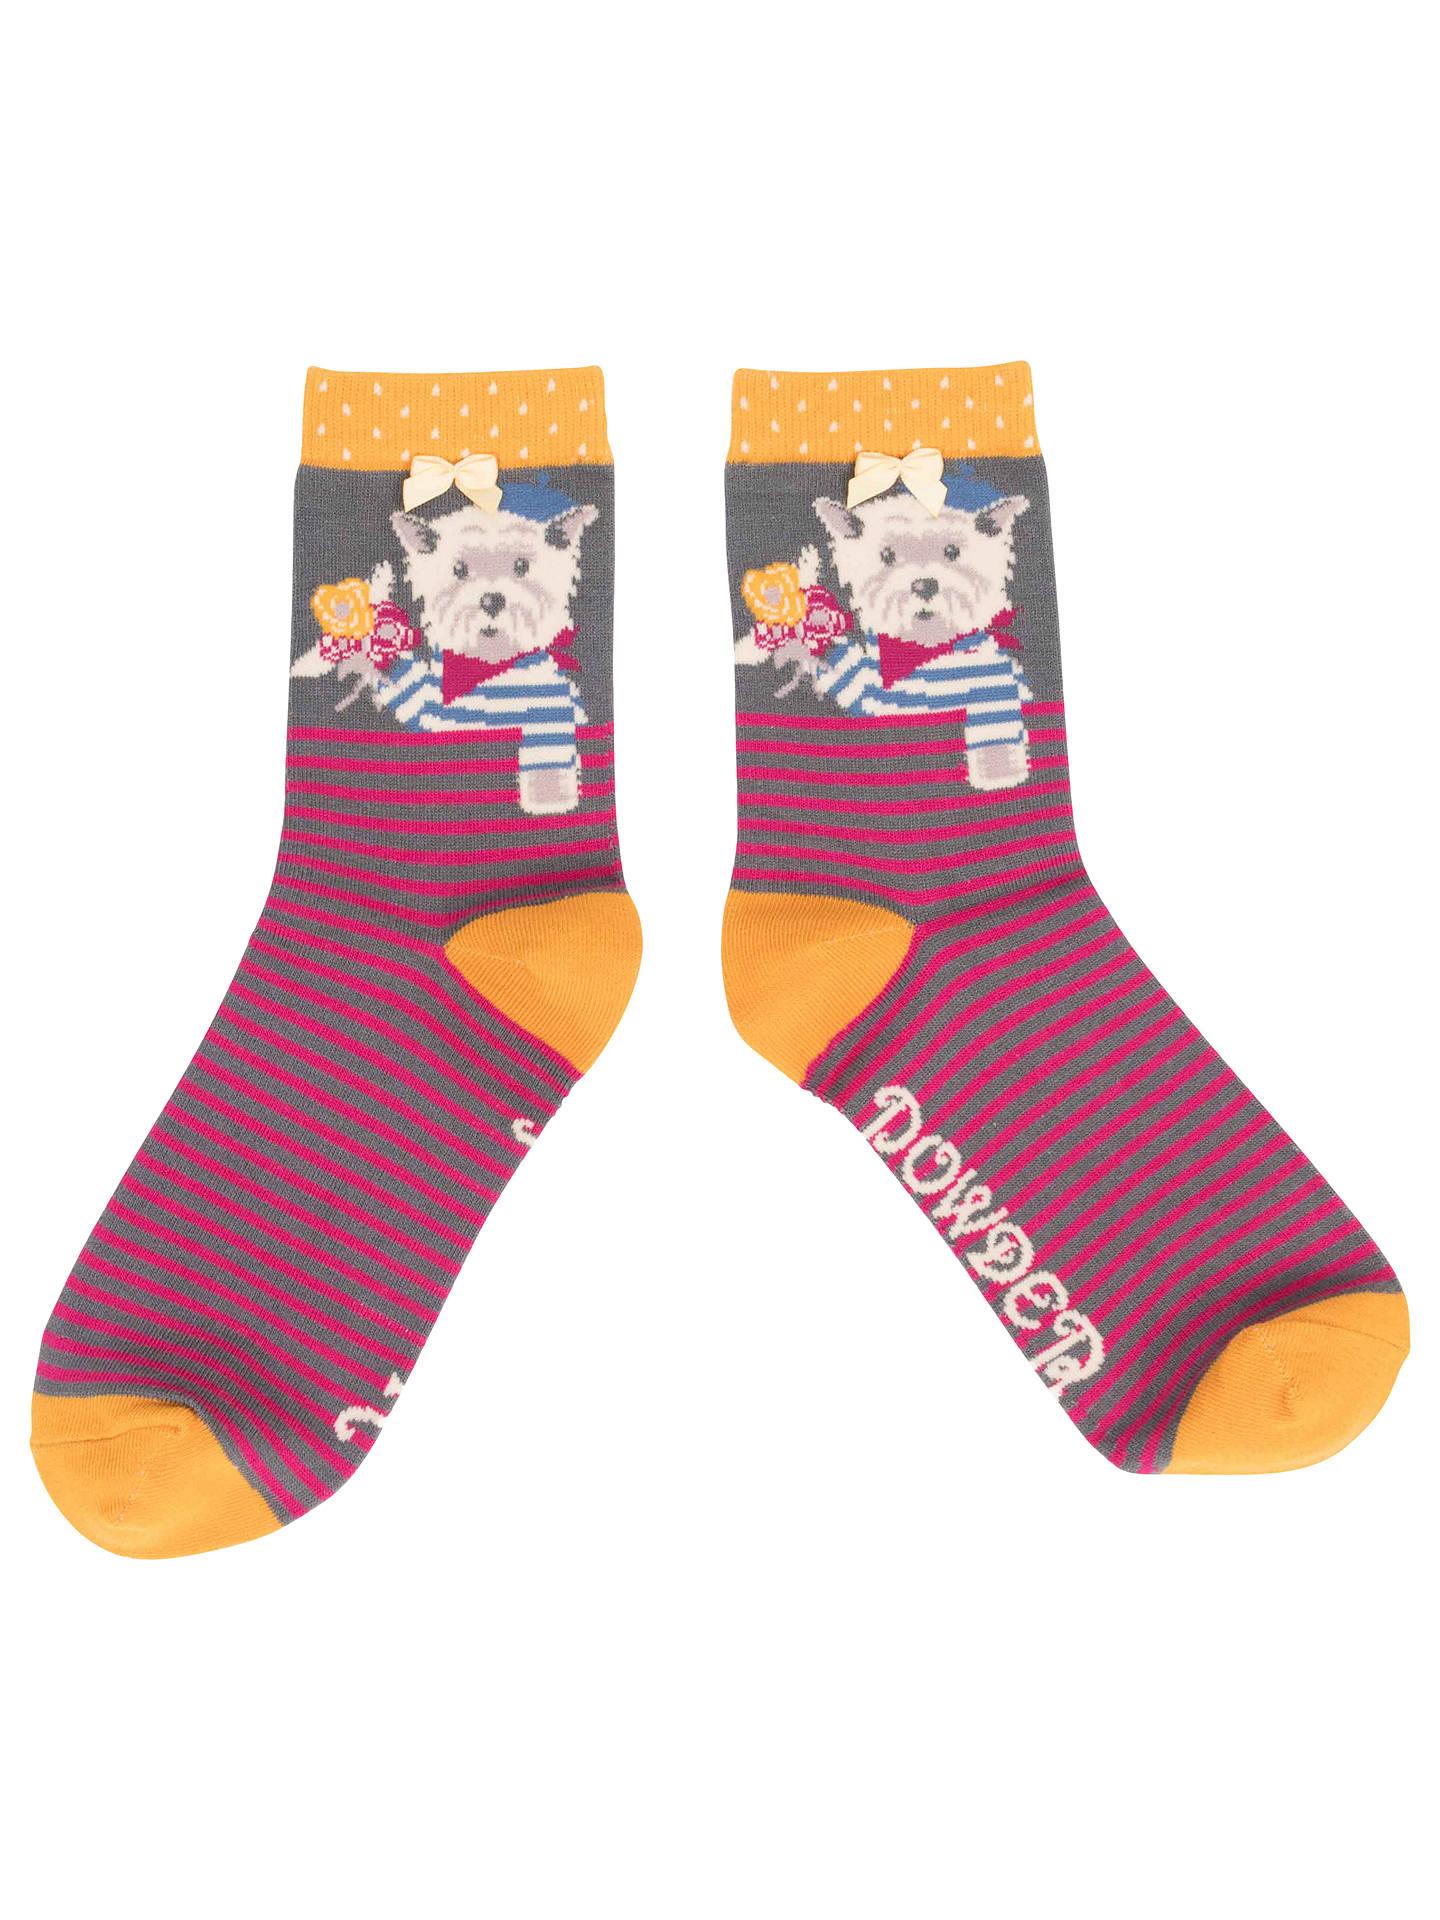 a9ba4d53ae6 Buy Powder French Westie Terrier Dog Ankle Socks